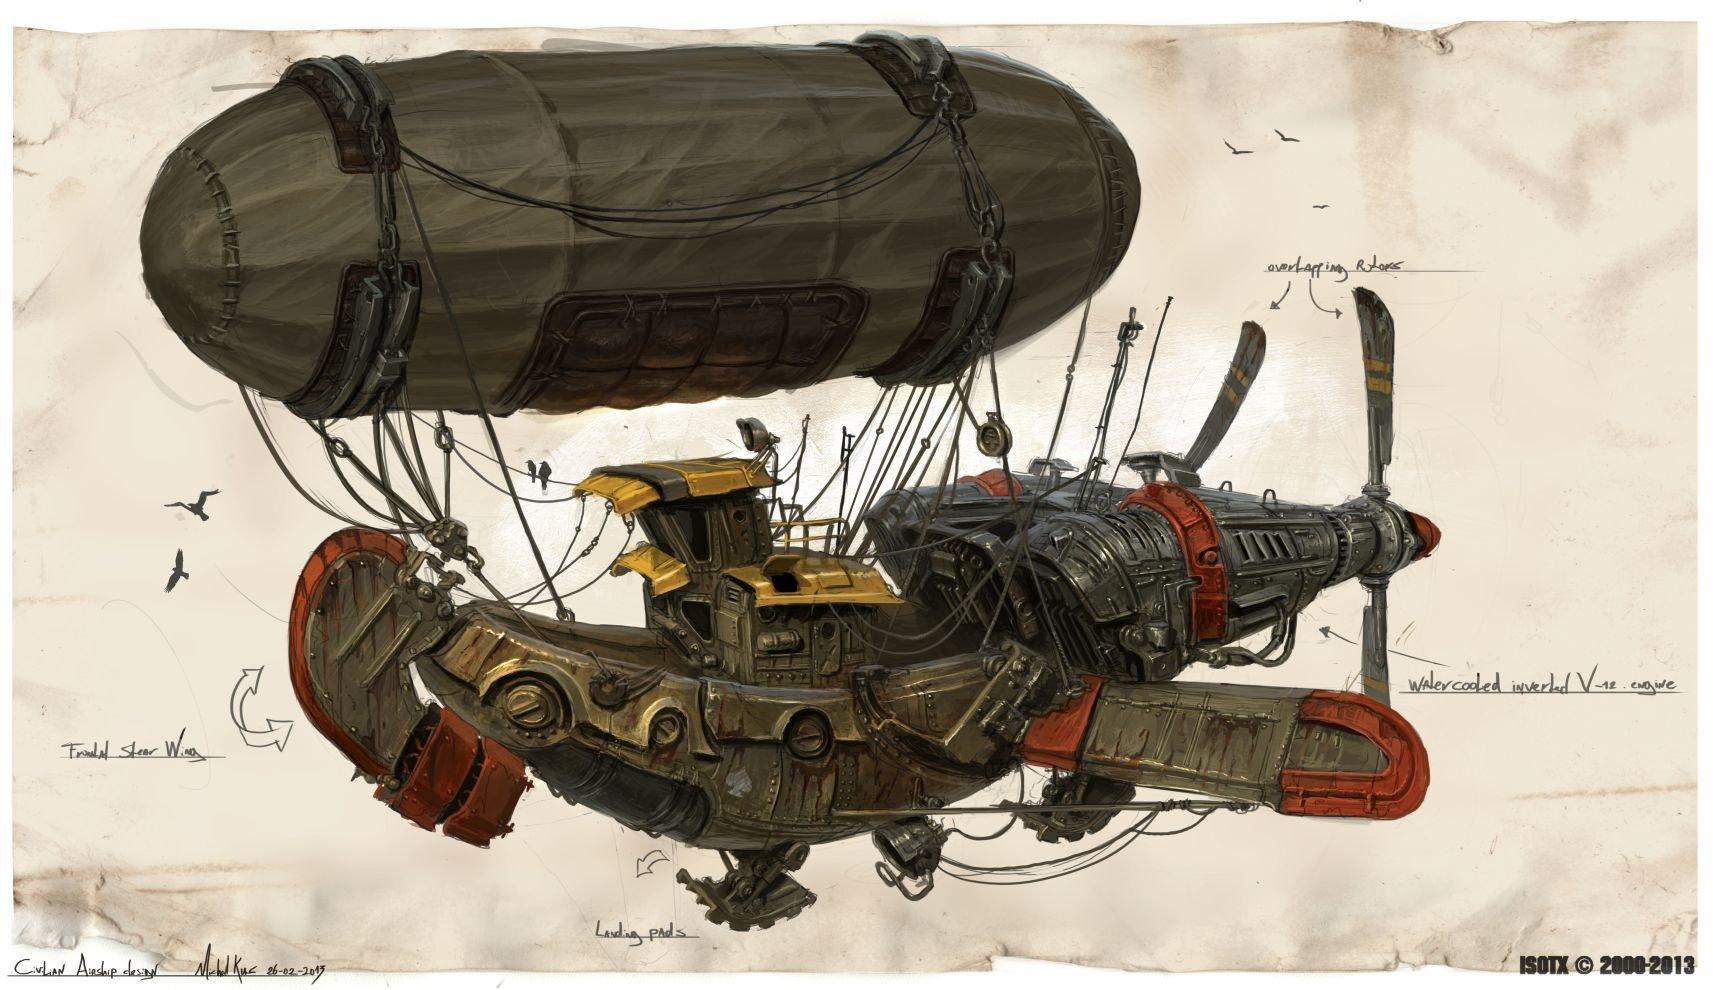 Michal kus marauders2 civilian airship final